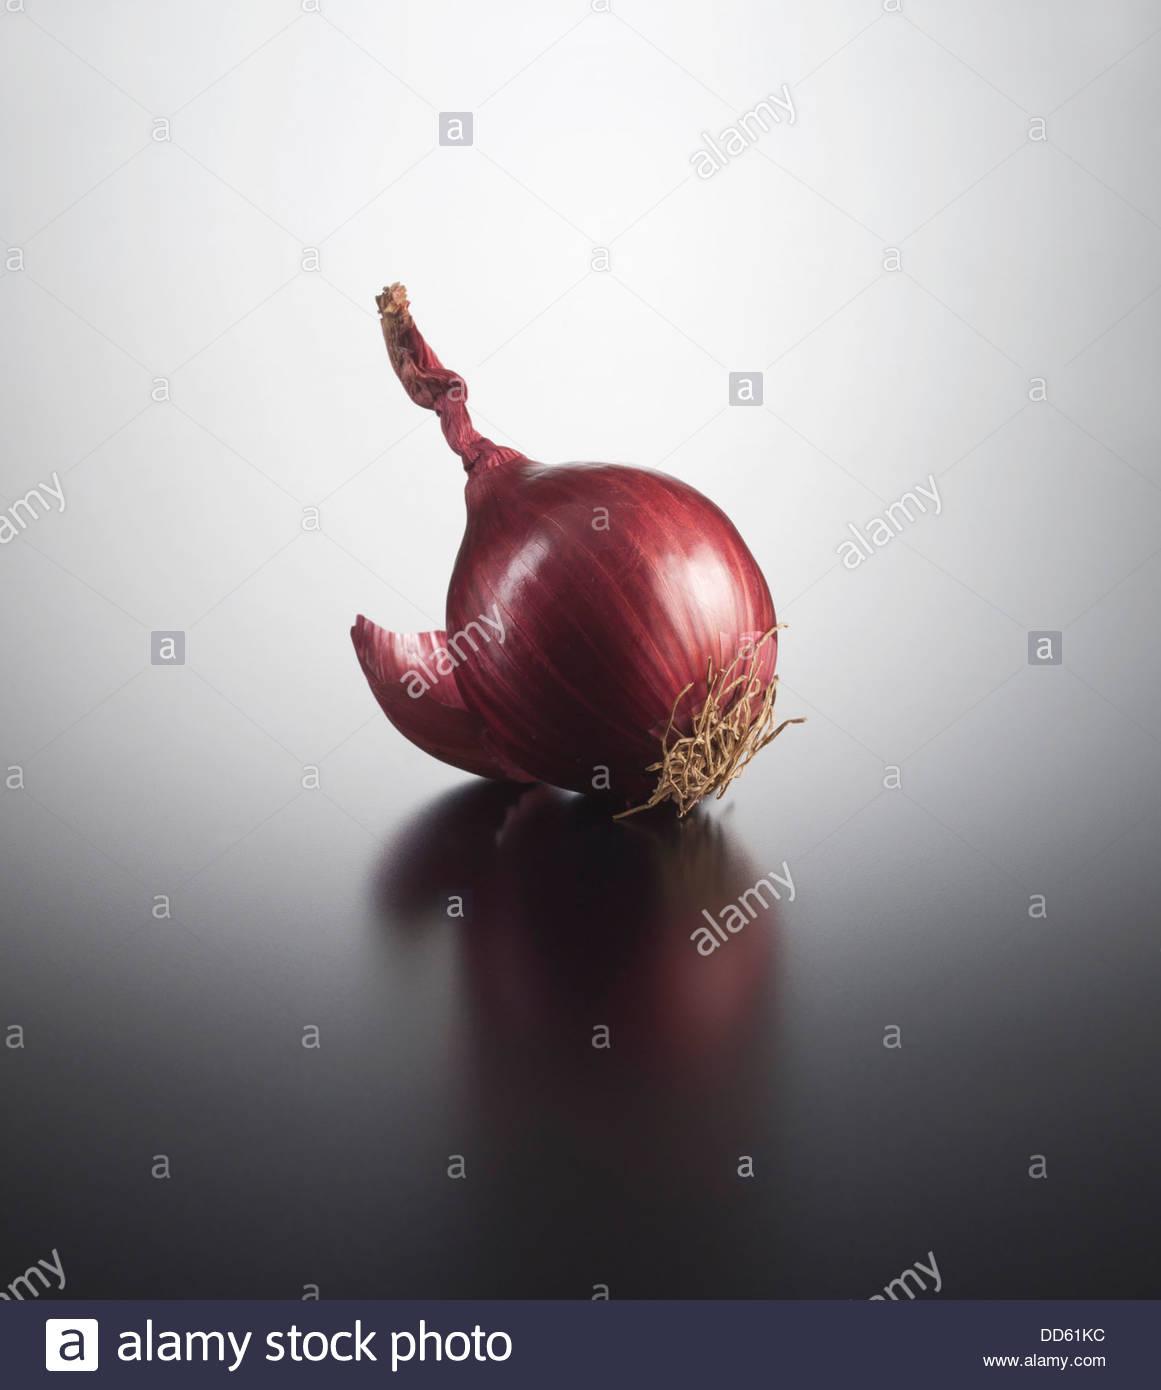 Onion on coloured background, close up - Stock Image